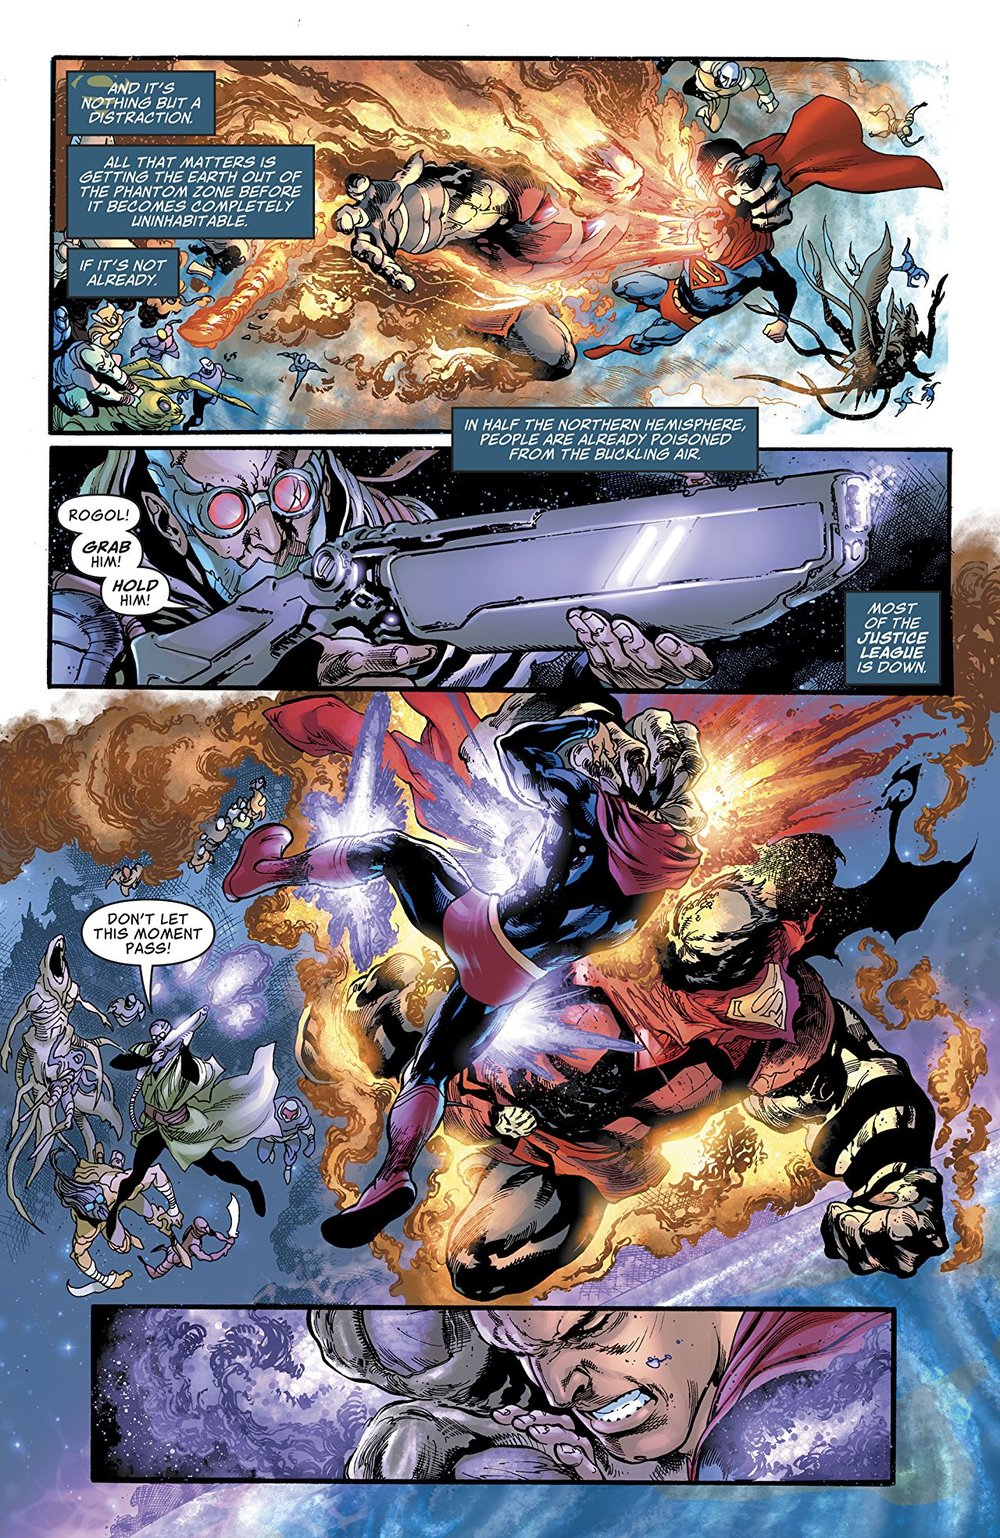 Superman 4 3.jpg